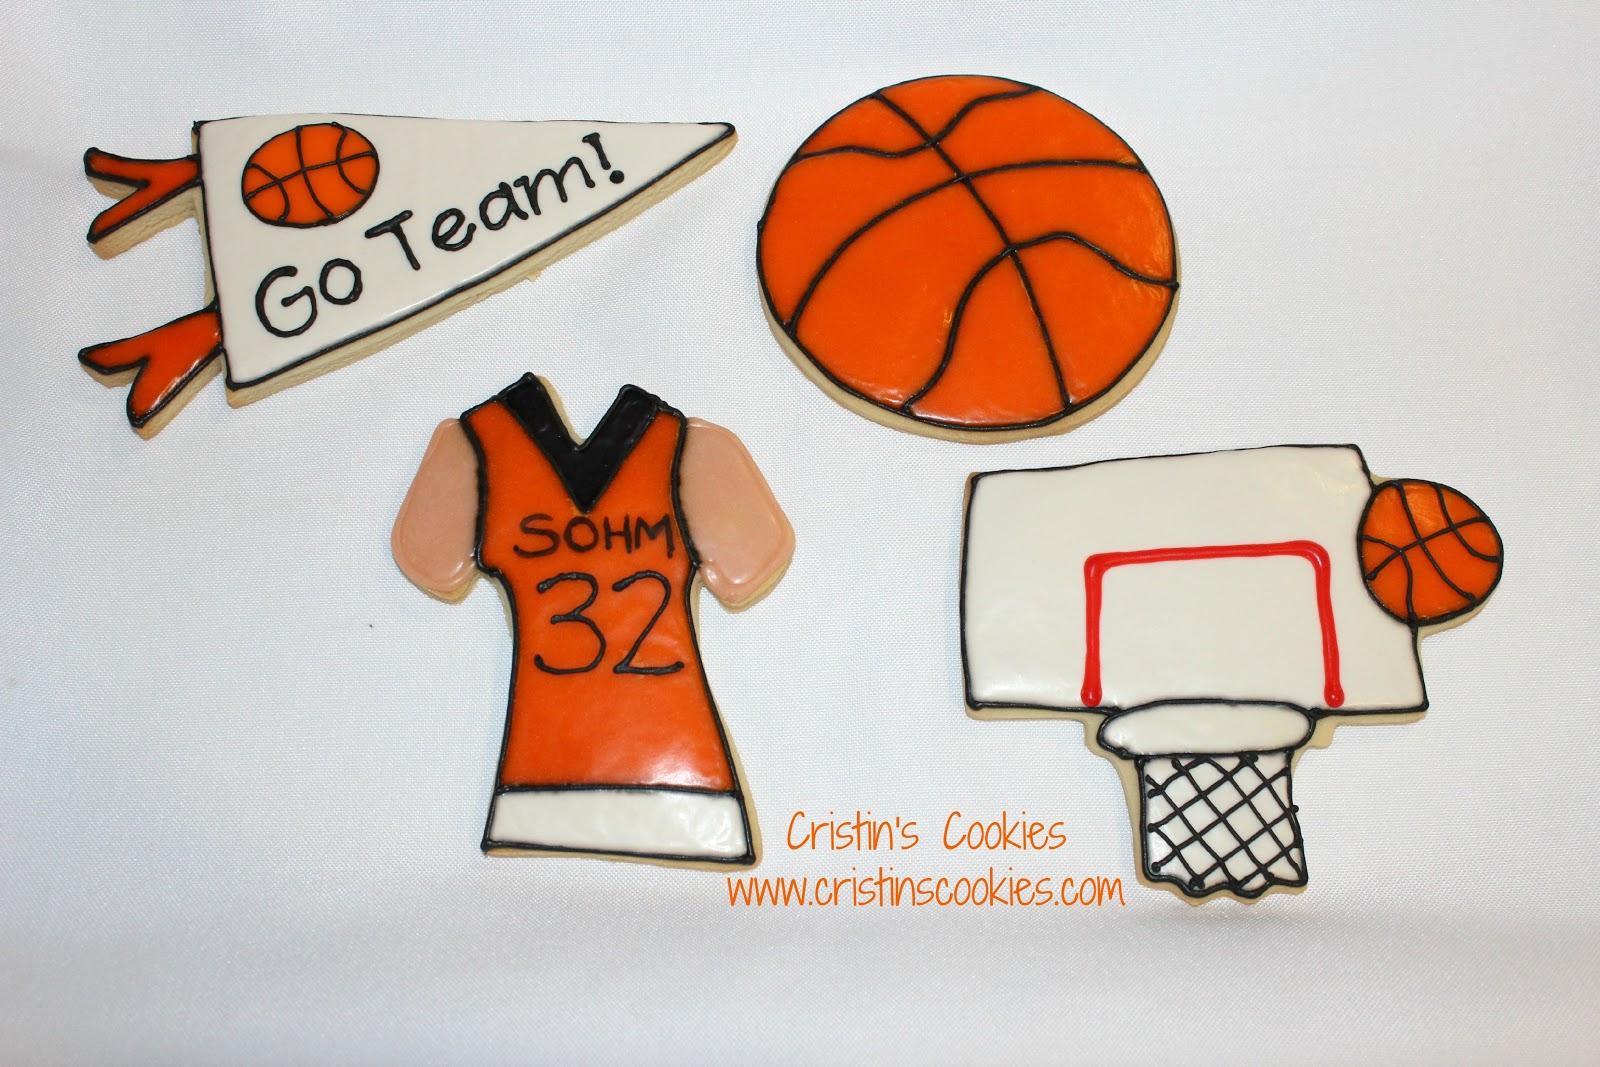 http://1.bp.blogspot.com/-MVXhimpSHRA/UJyzfeSwVkI/AAAAAAAABJE/0Sb2QvthWqc/s1600/Basketball%2Bby%2BCristins%2BCookies%2B001.jpg